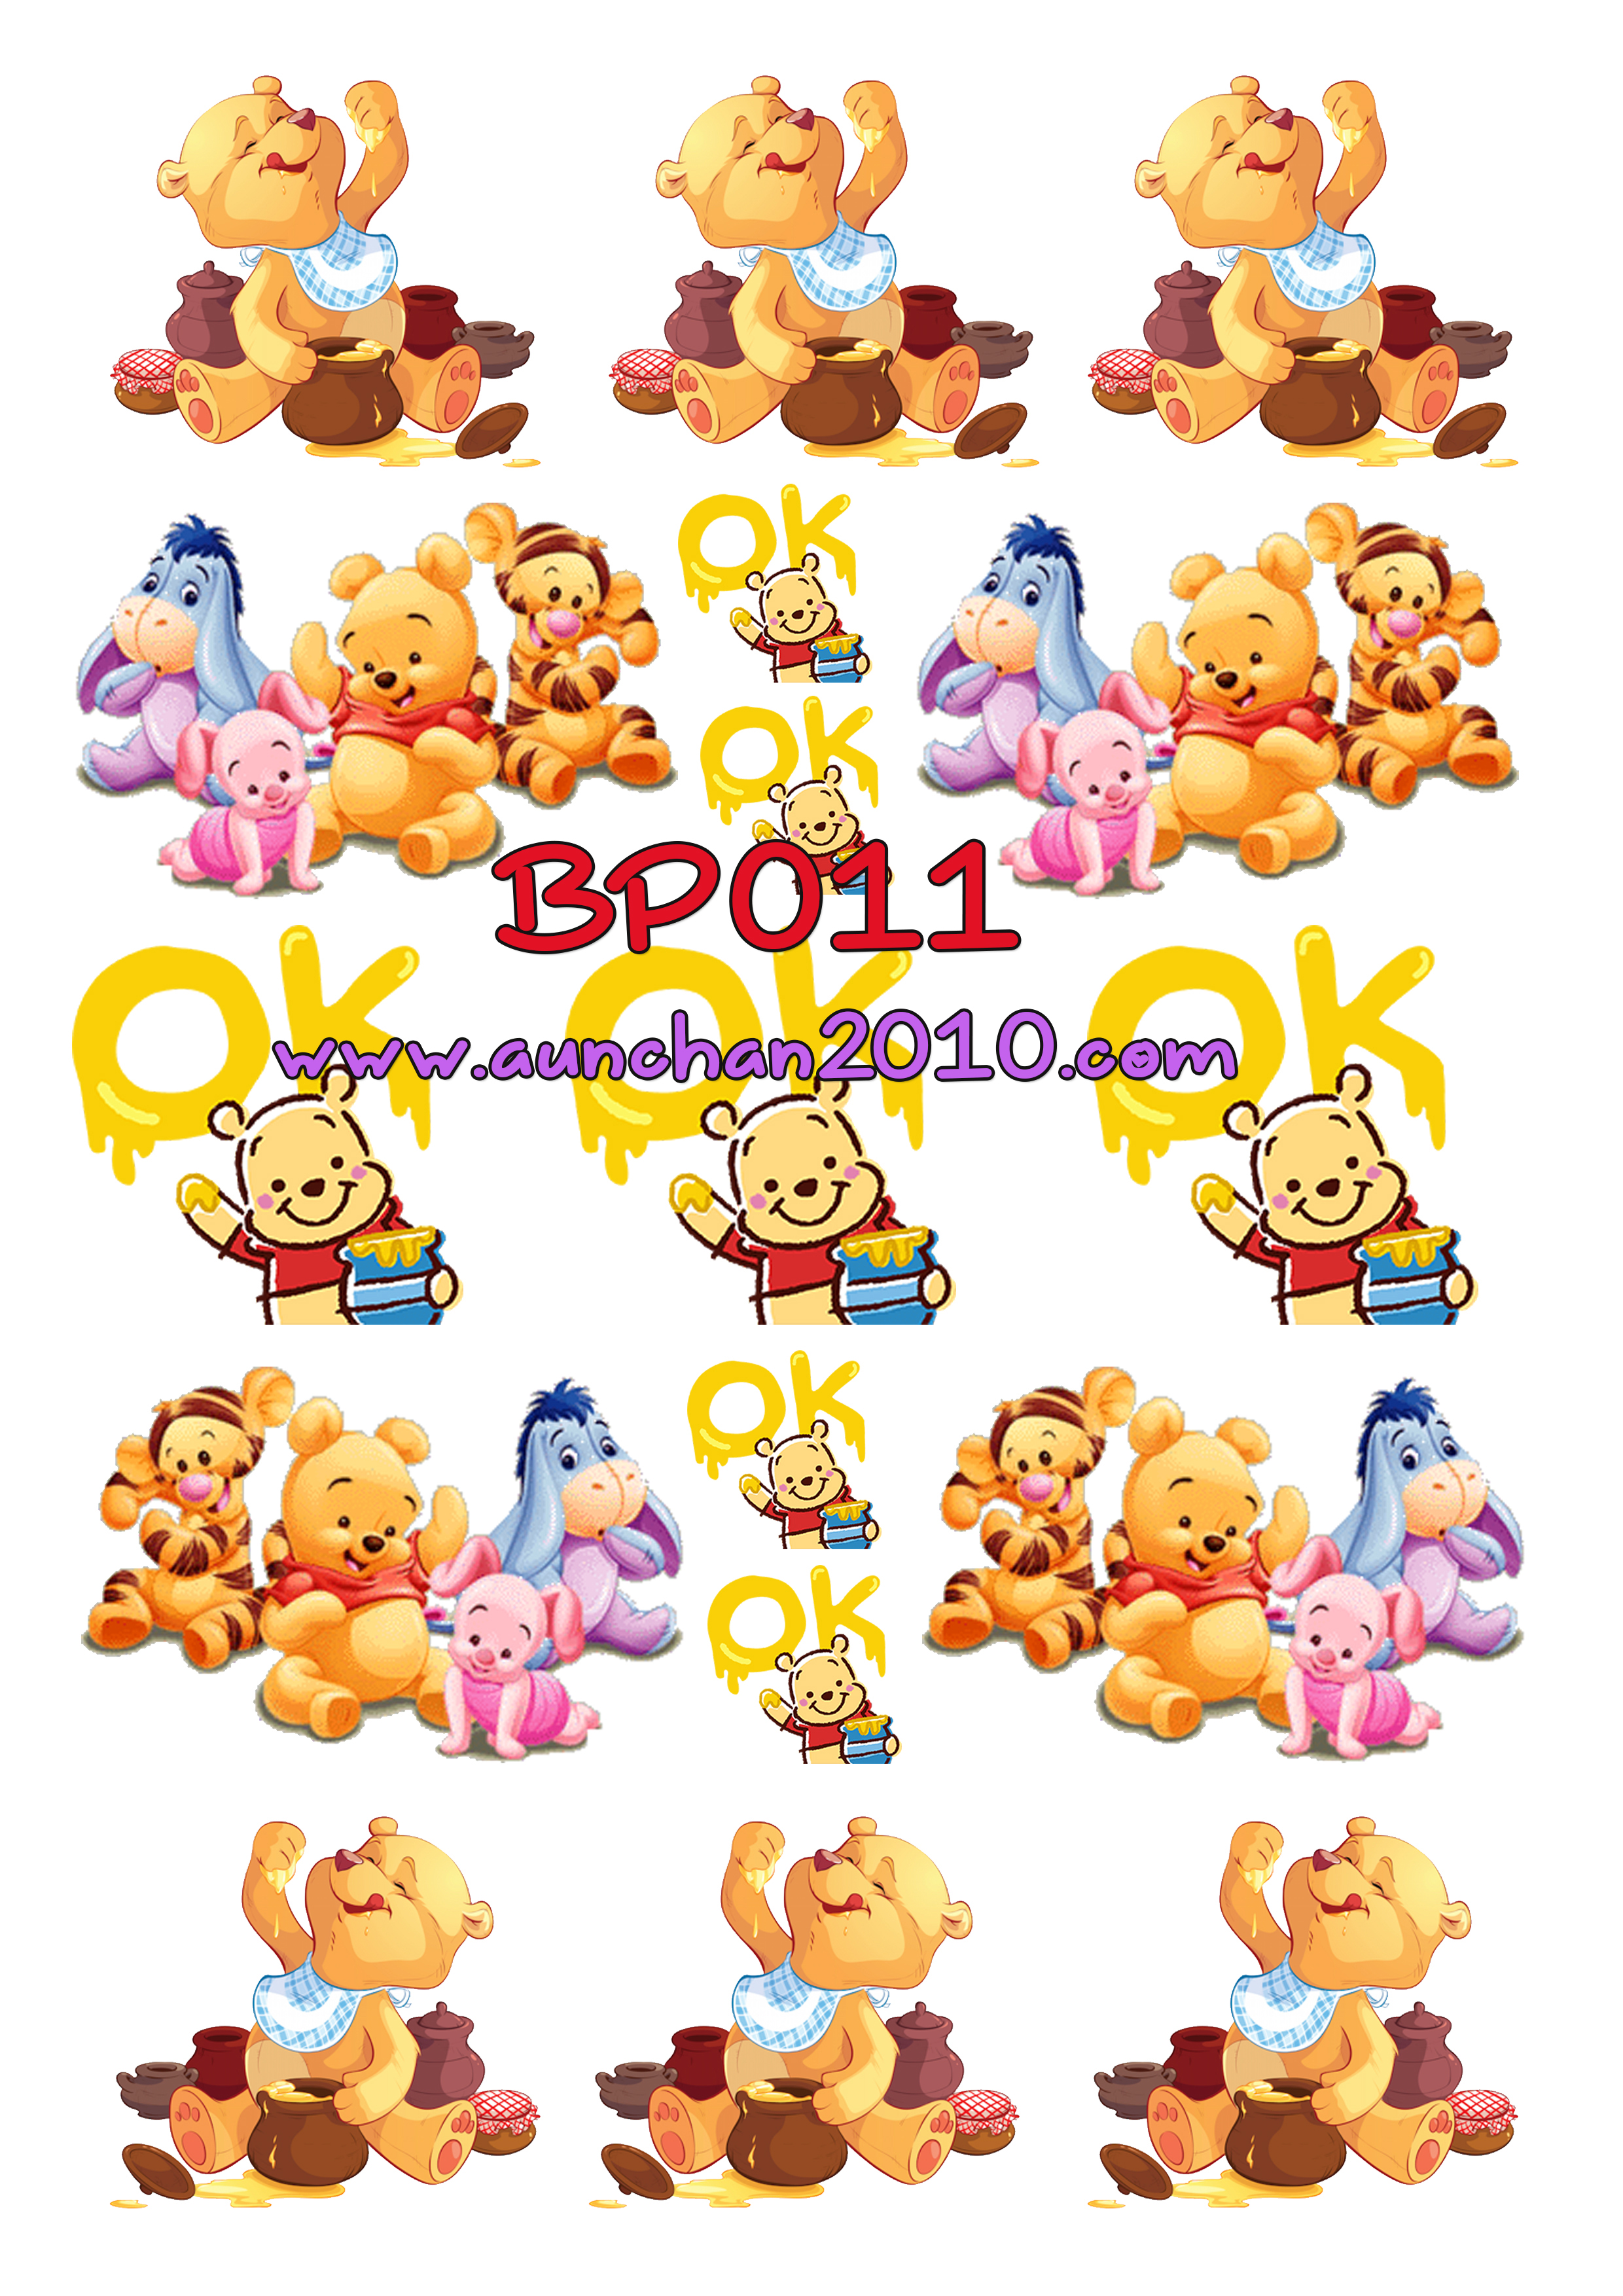 BP011 กระดาษแนพกิ้น 21x30ซม. ลายหมีพูห์